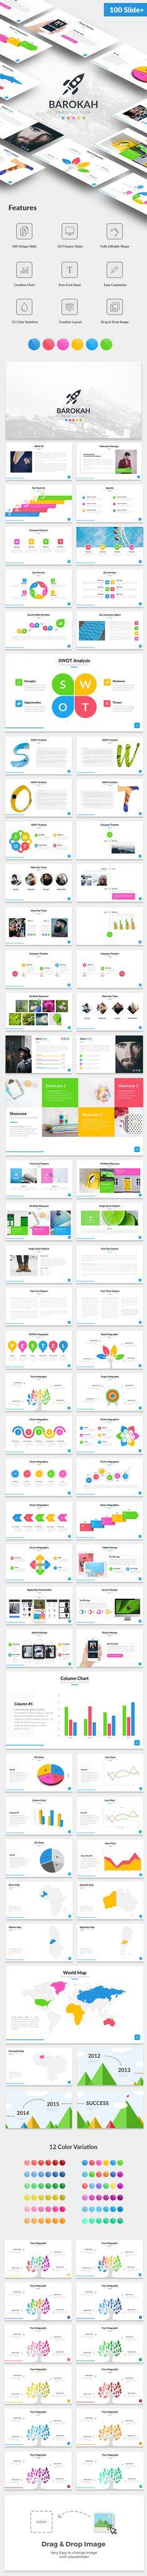 Barokah Multipurpose Powerpoint Template